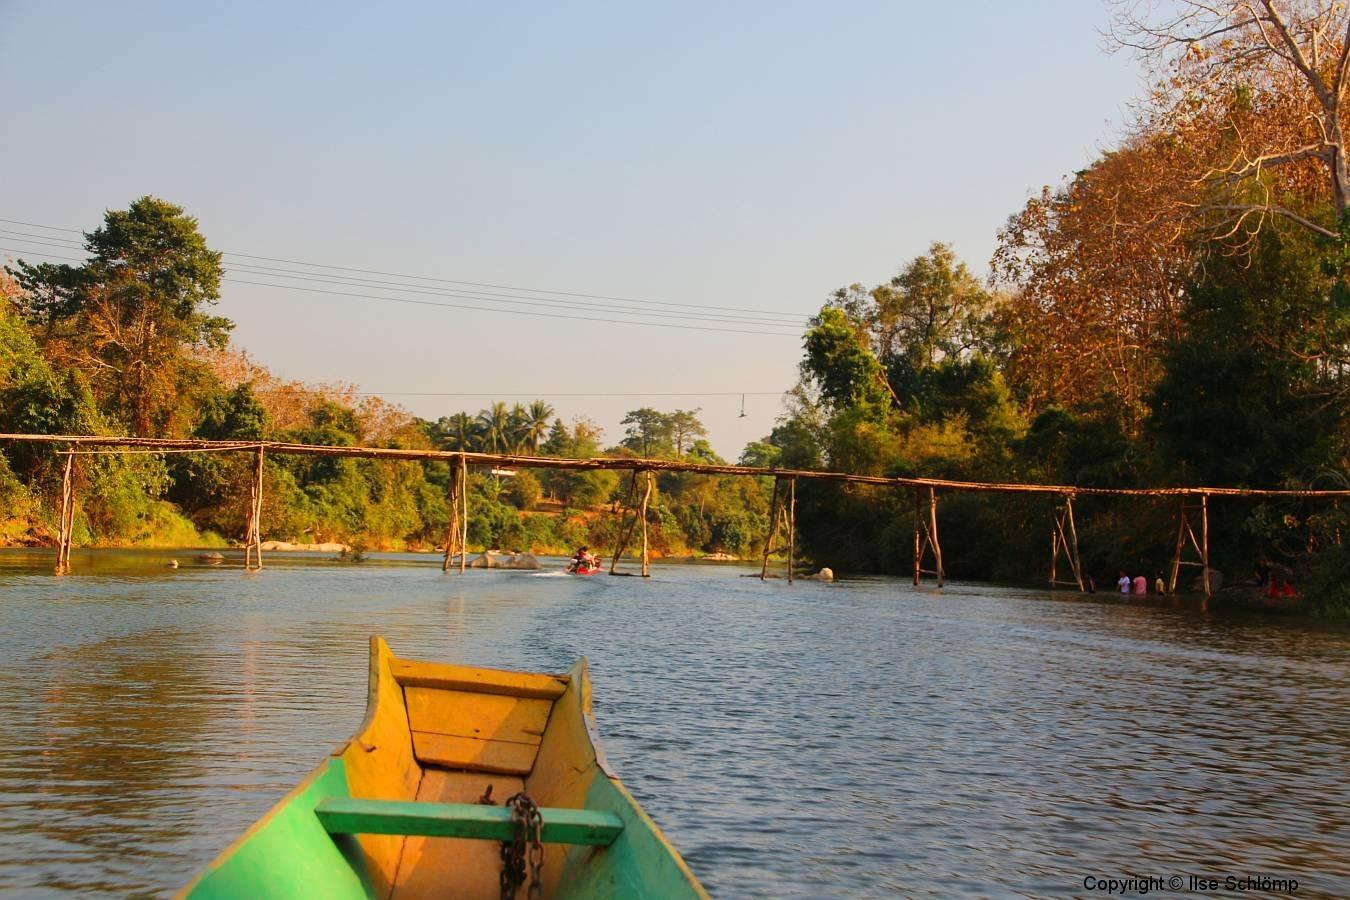 Laos, Vang Vieng, Nang Song Fluss, Bambusbrücke